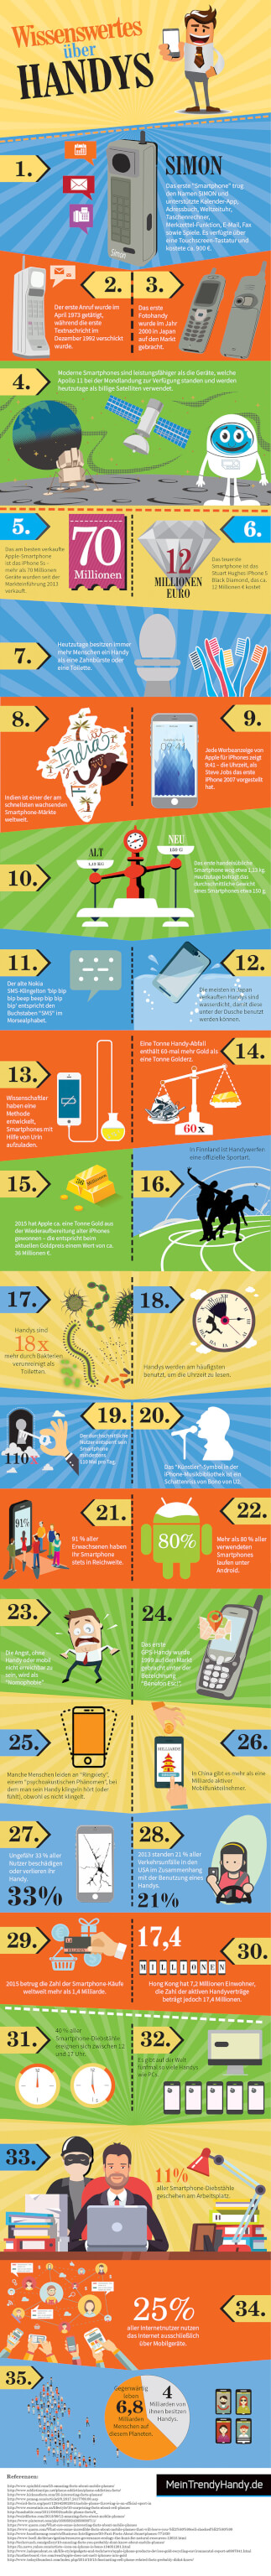 Infografik: Fun-Facts über Handys, Bild: MeinTrendyHandy